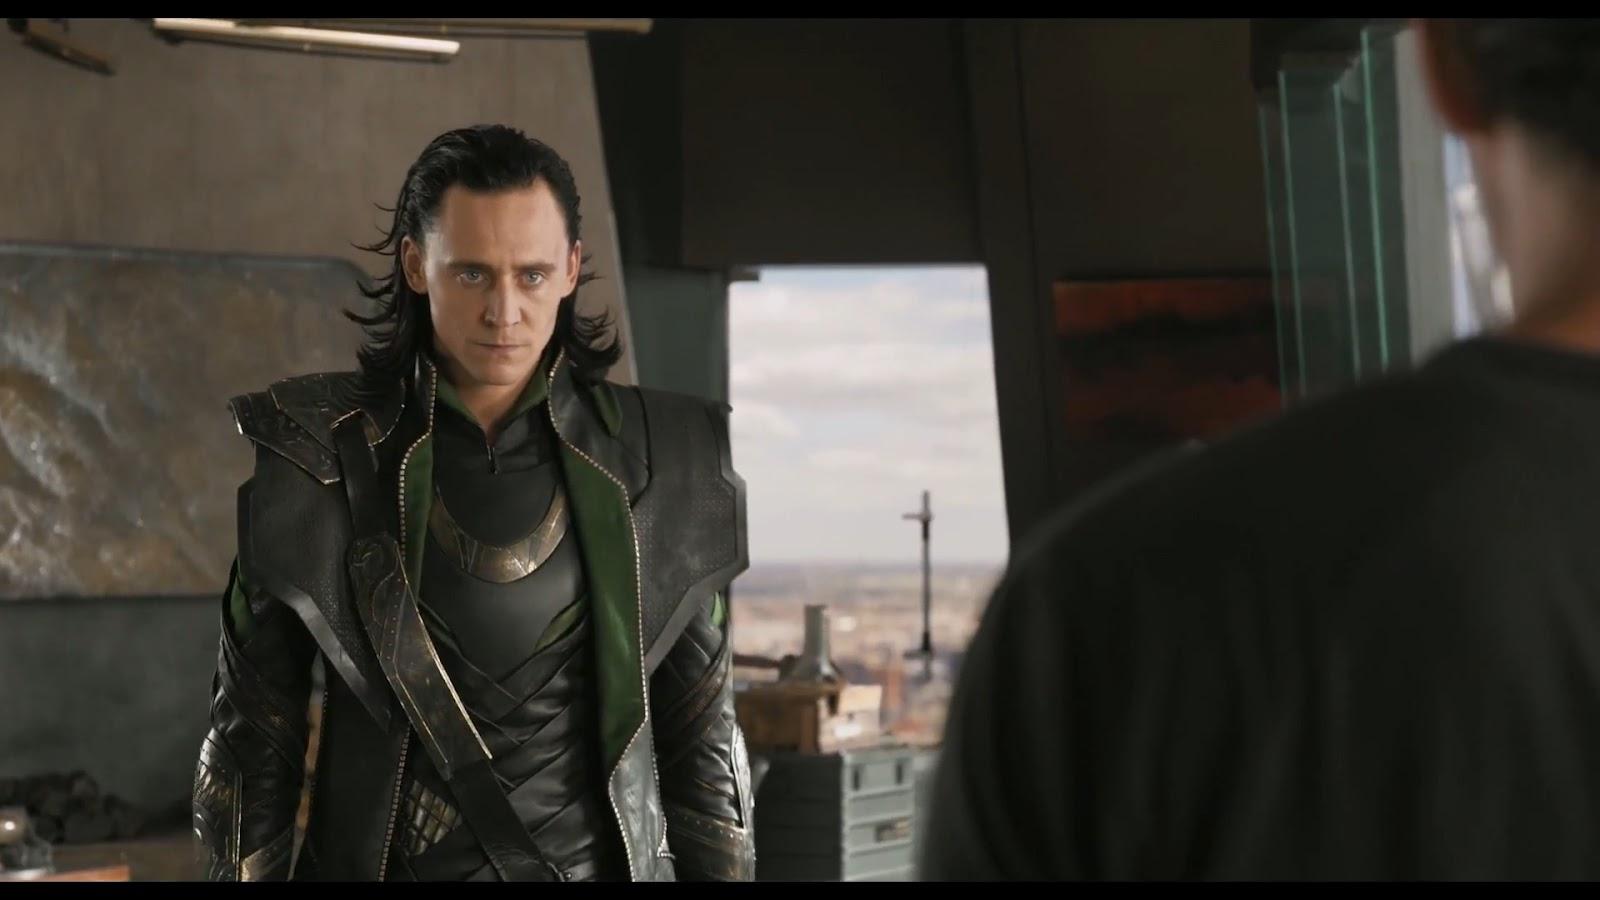 "... "" scene with Loki VS Tony Stark - also a behind the scenes video"